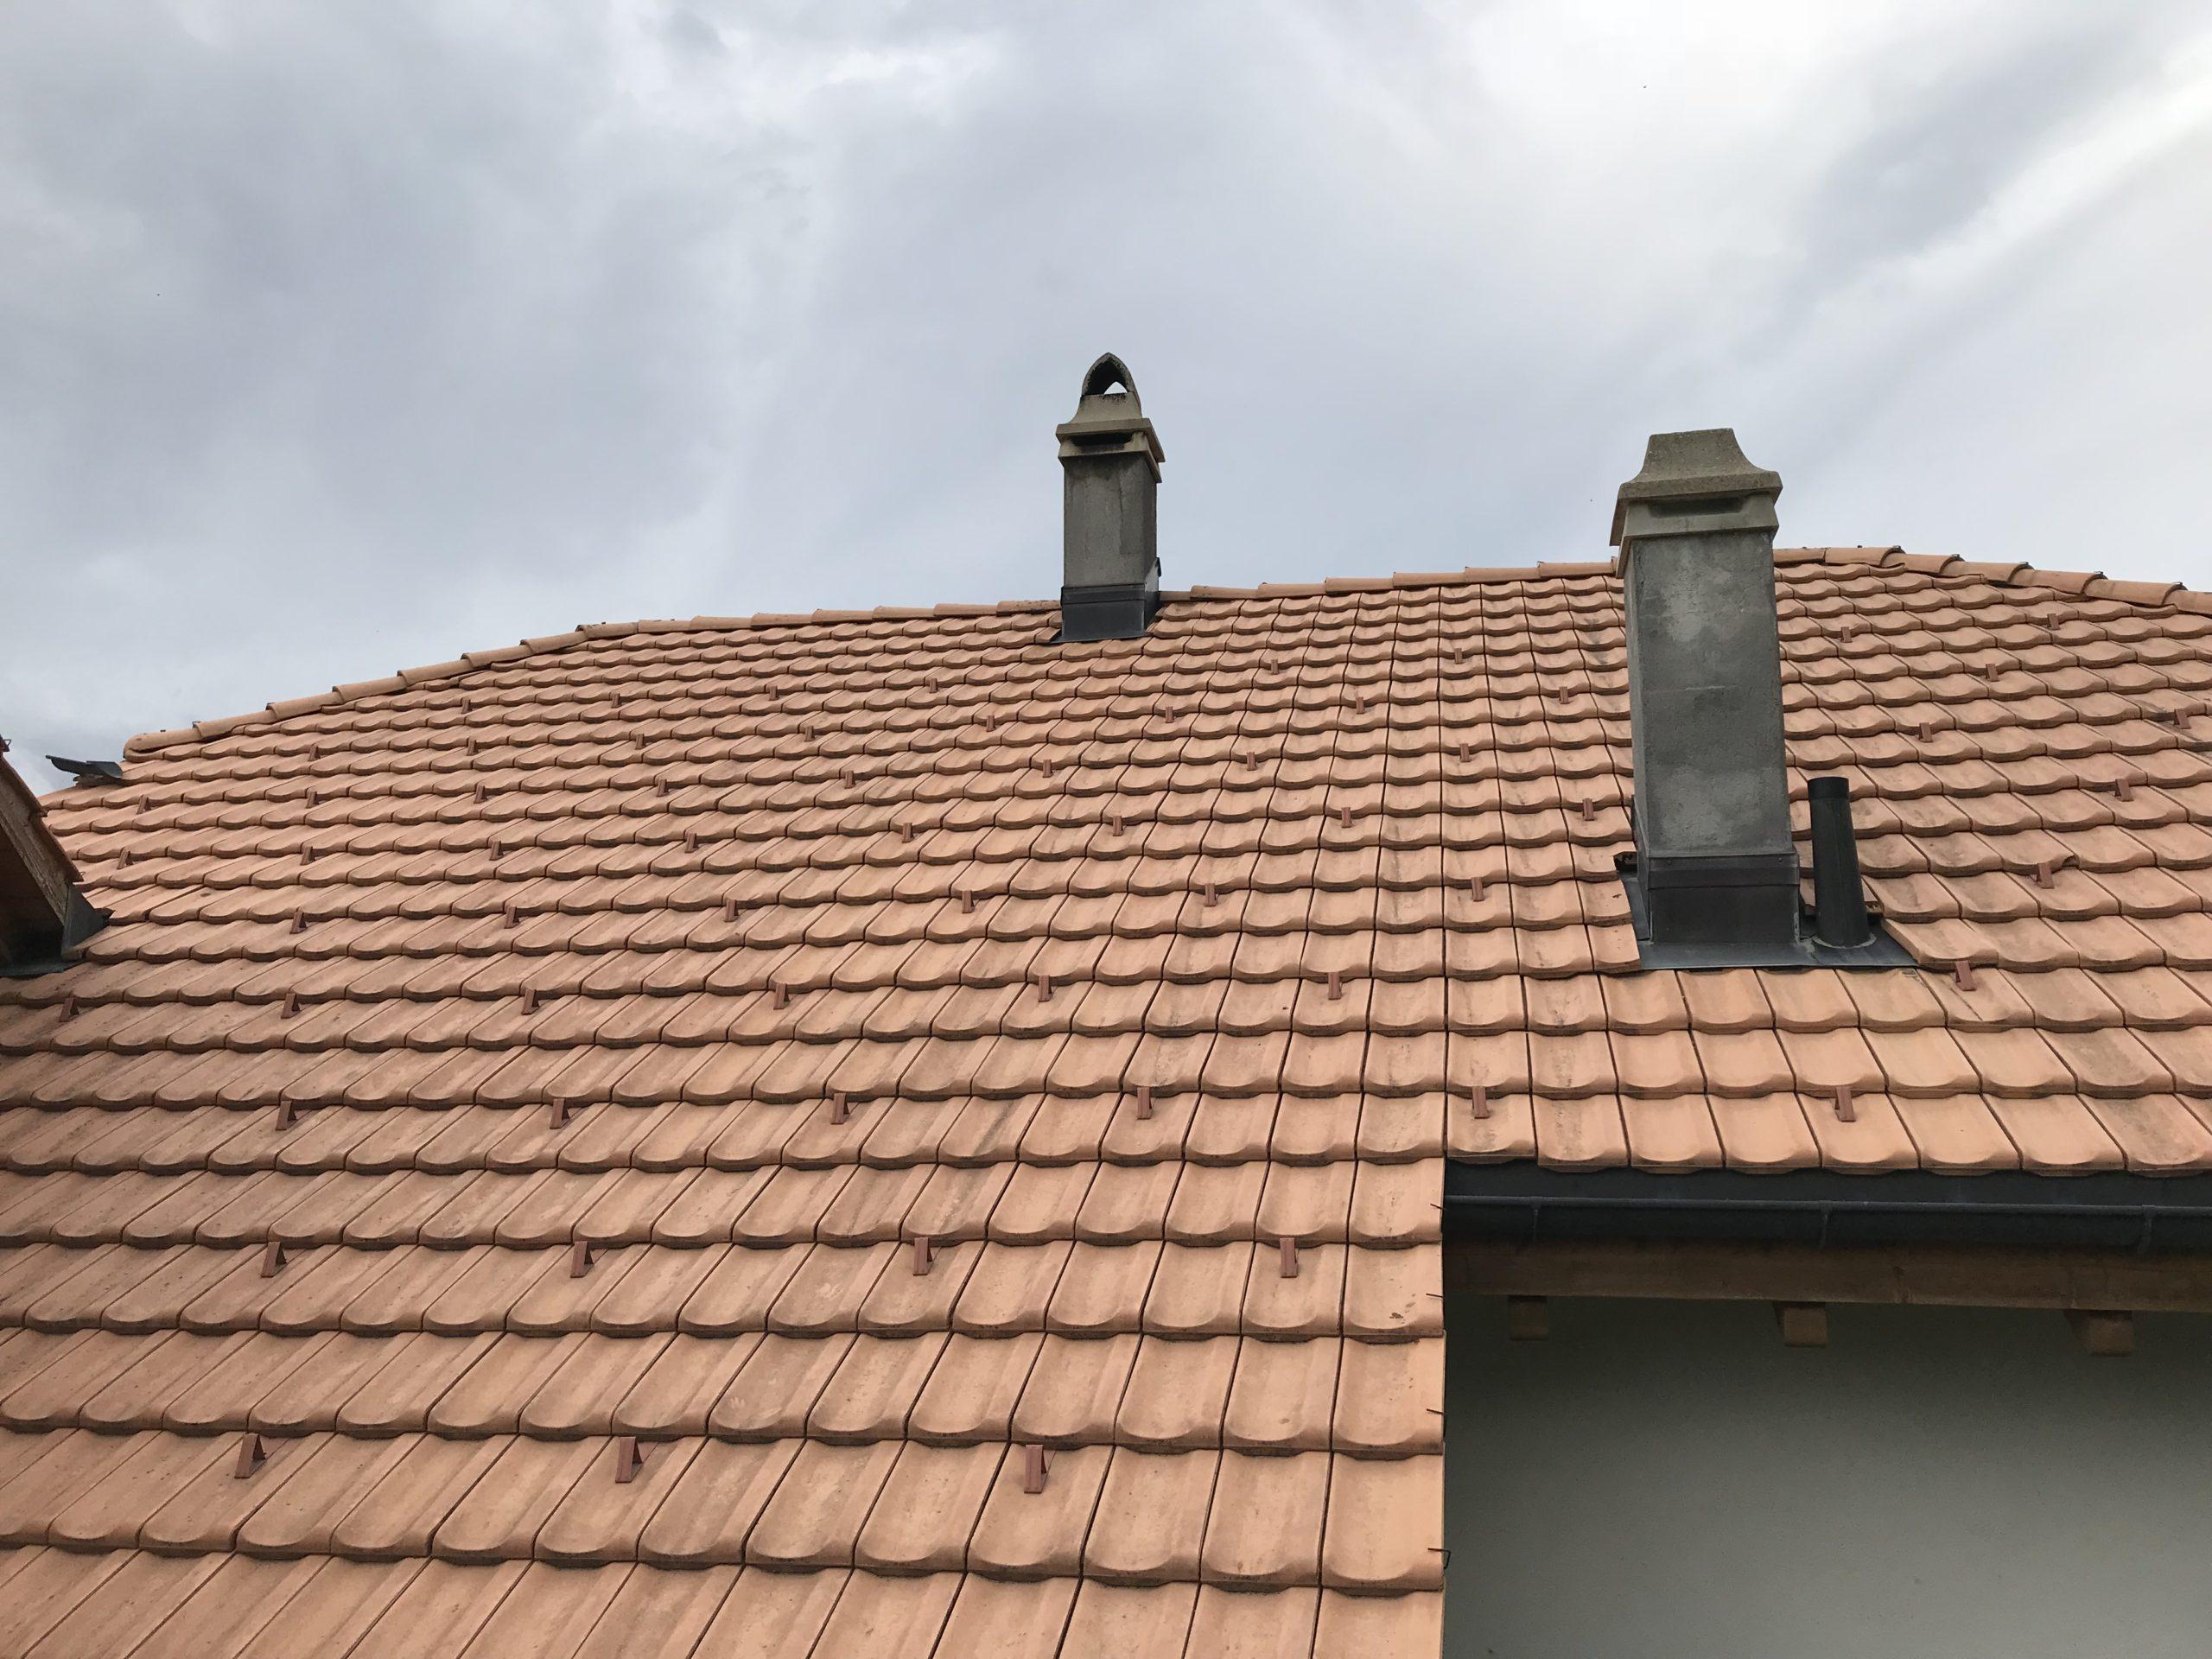 https://www.koster-gs.ch/wp-content/uploads/2020/07/Dach-Mosca-Igis-nachher-scaled.jpg